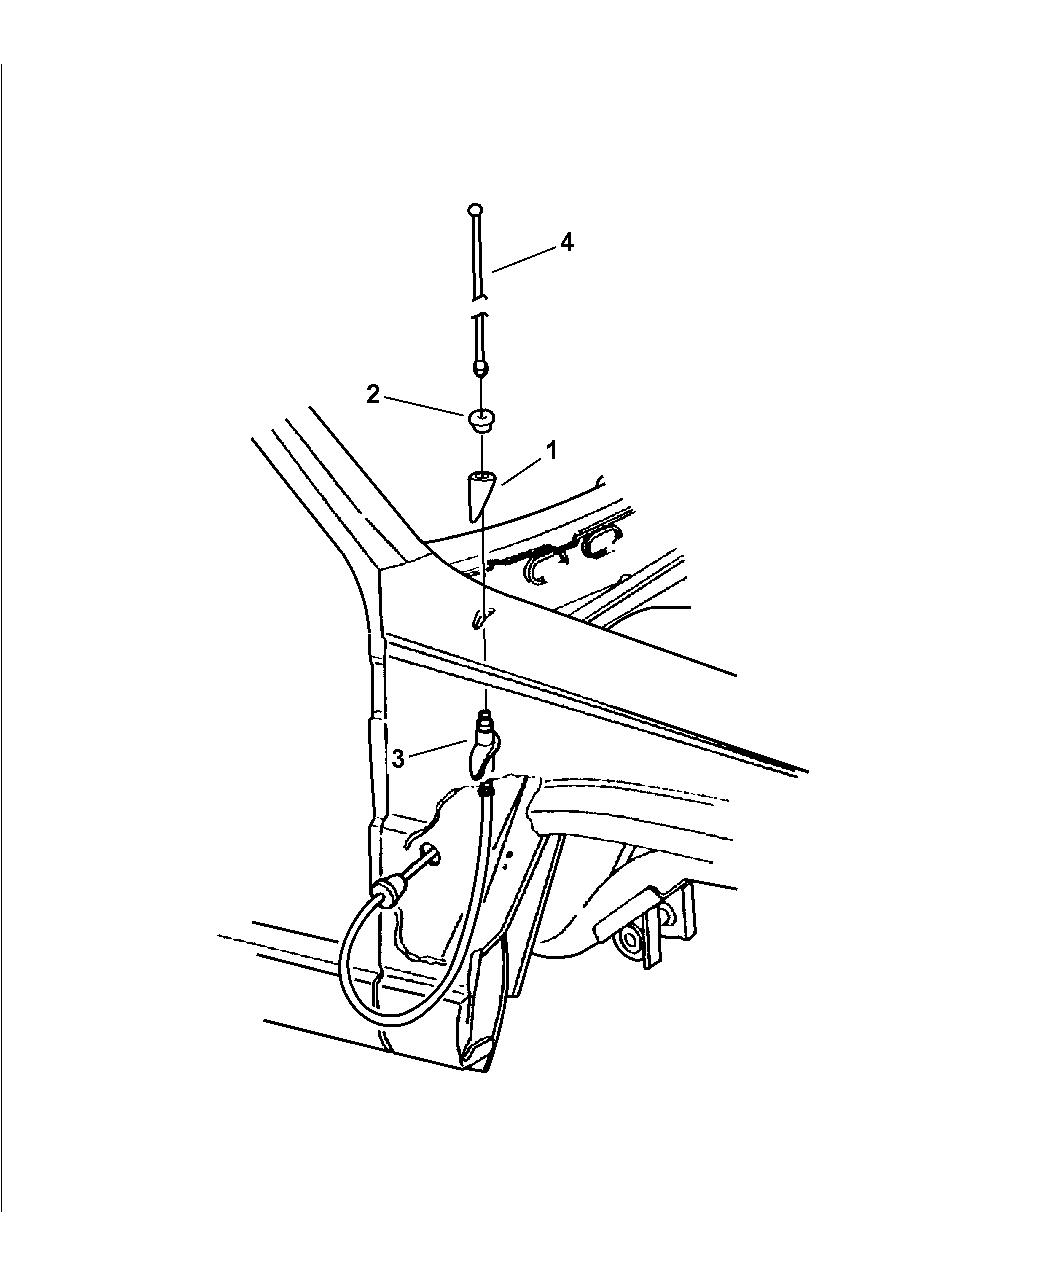 1998 jeep grand cherokee antenna